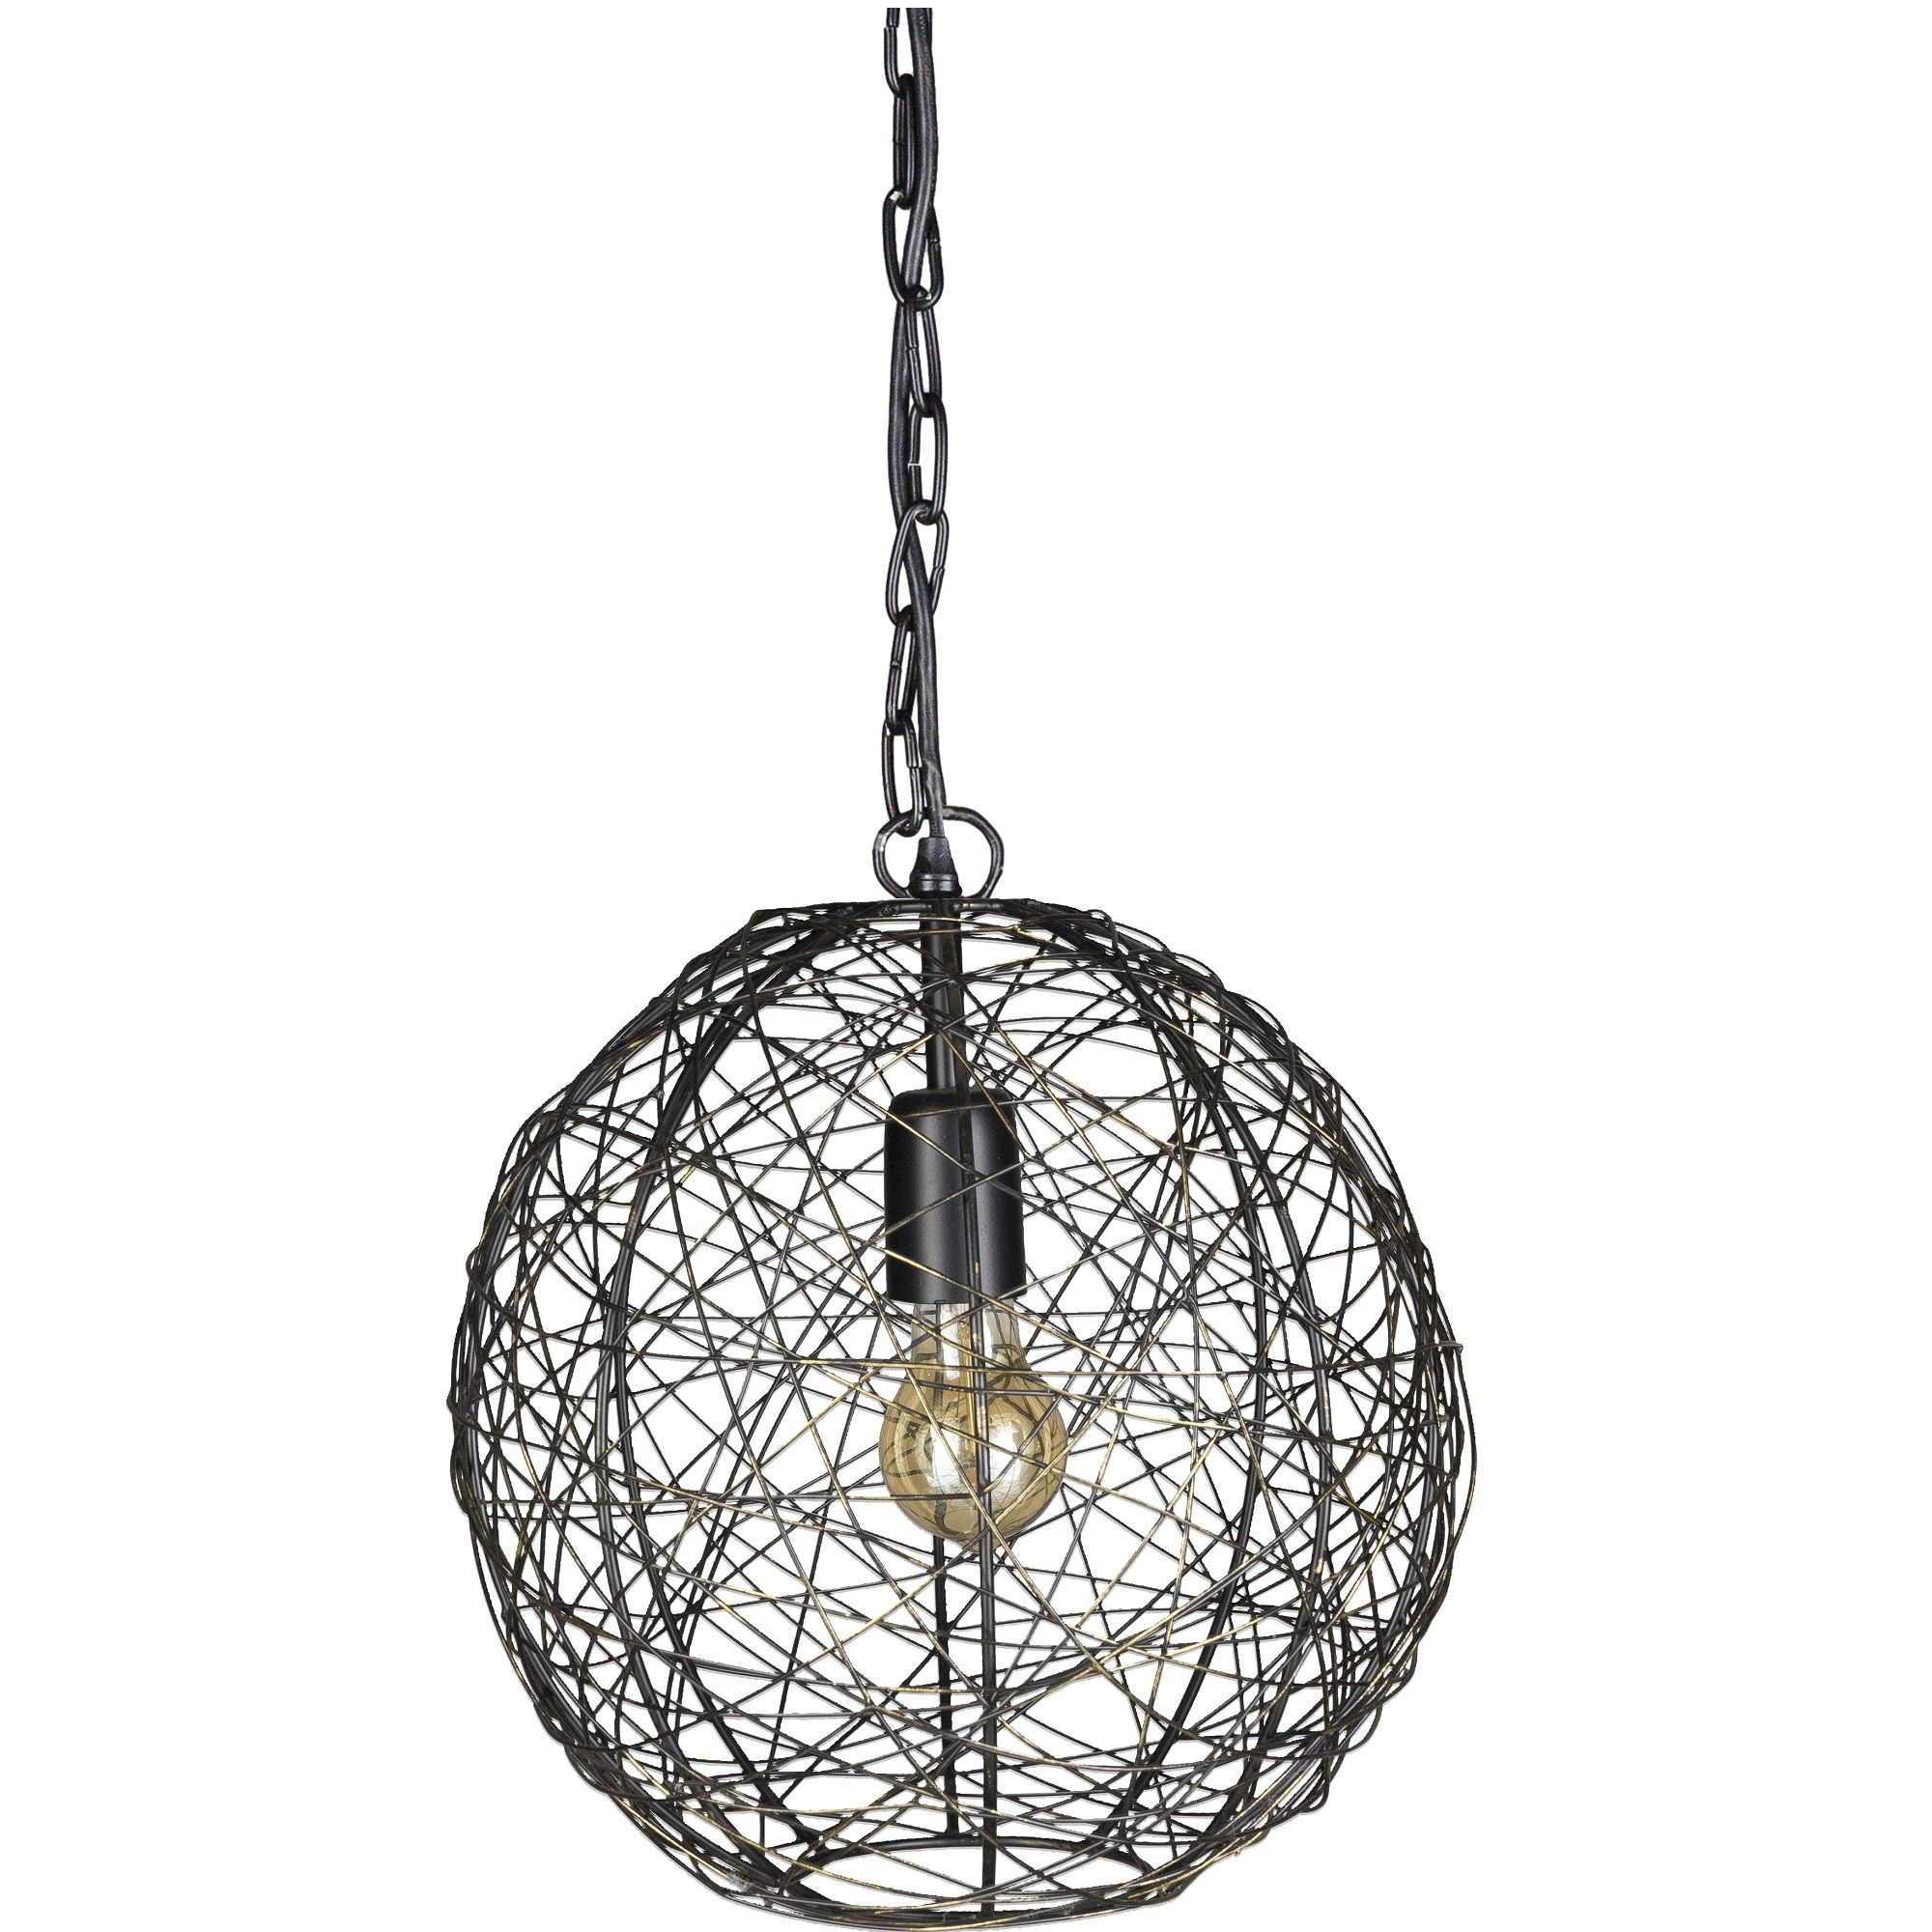 14 Bronze Round Wire Design Hanging Pendant Ceiling Light Fixture Wire Pendant Light Ceiling Lights Ceiling Pendant Lights